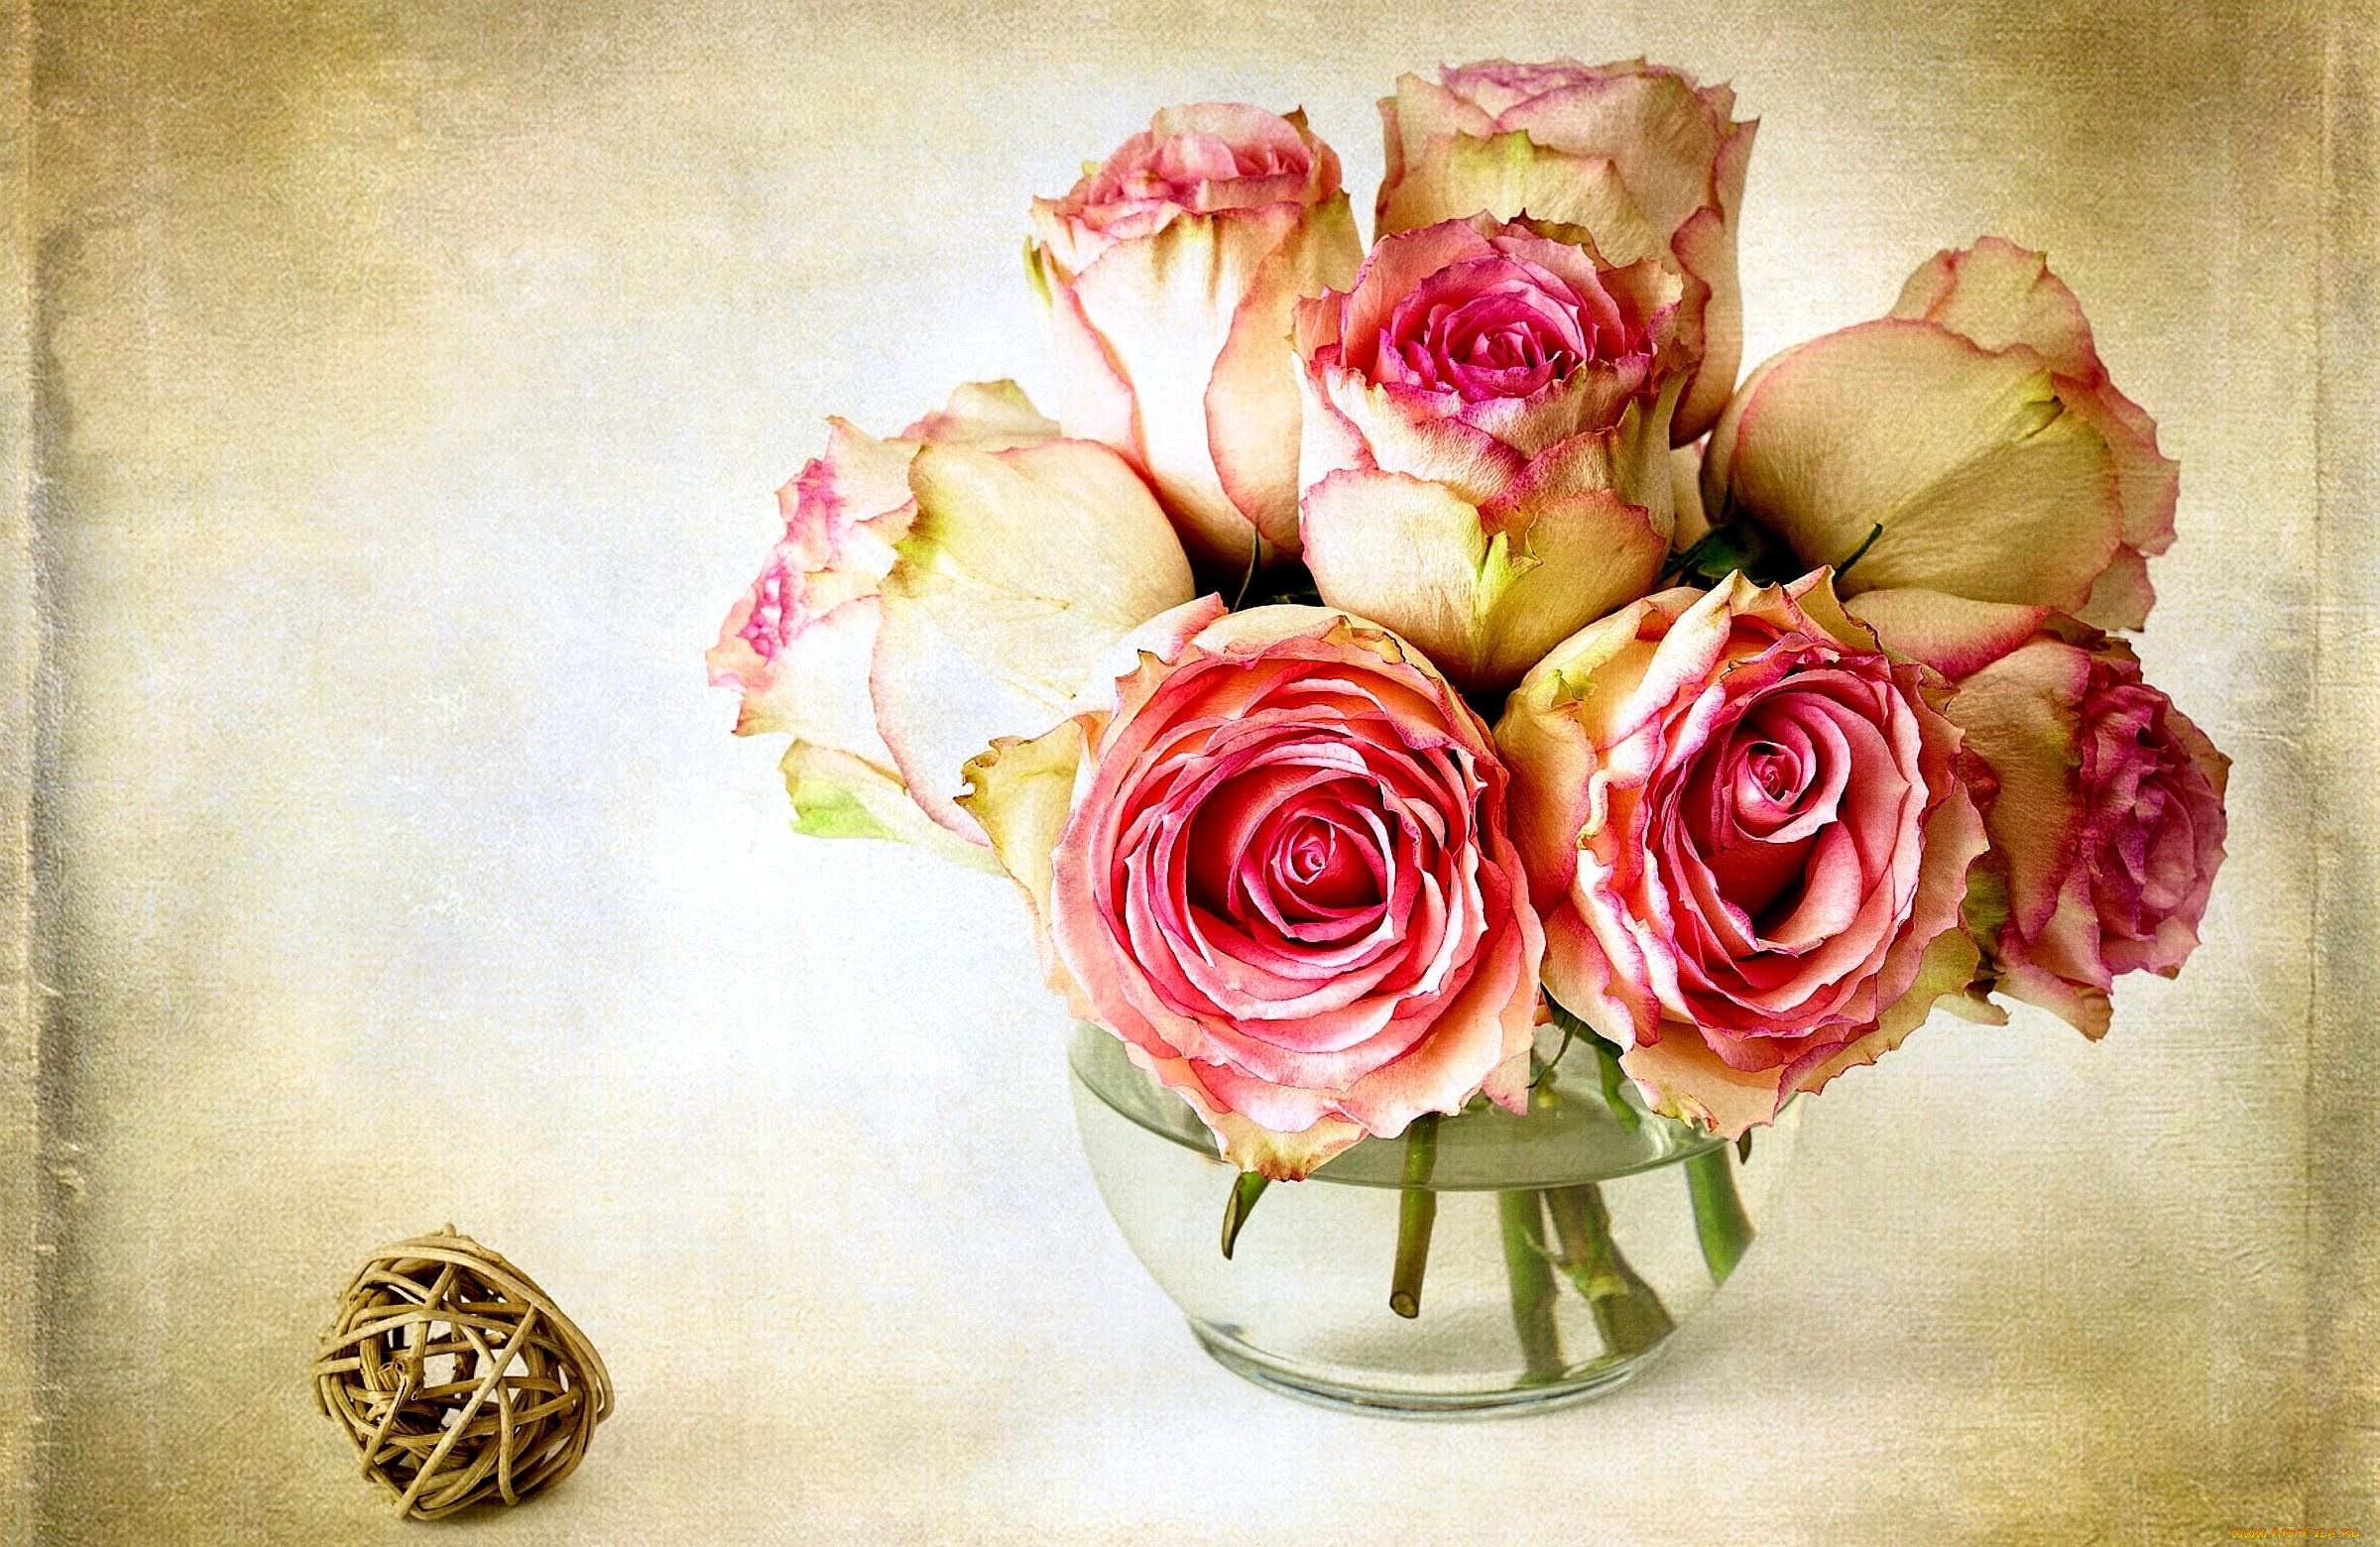 Открытки роз на рабочий стол, пчела